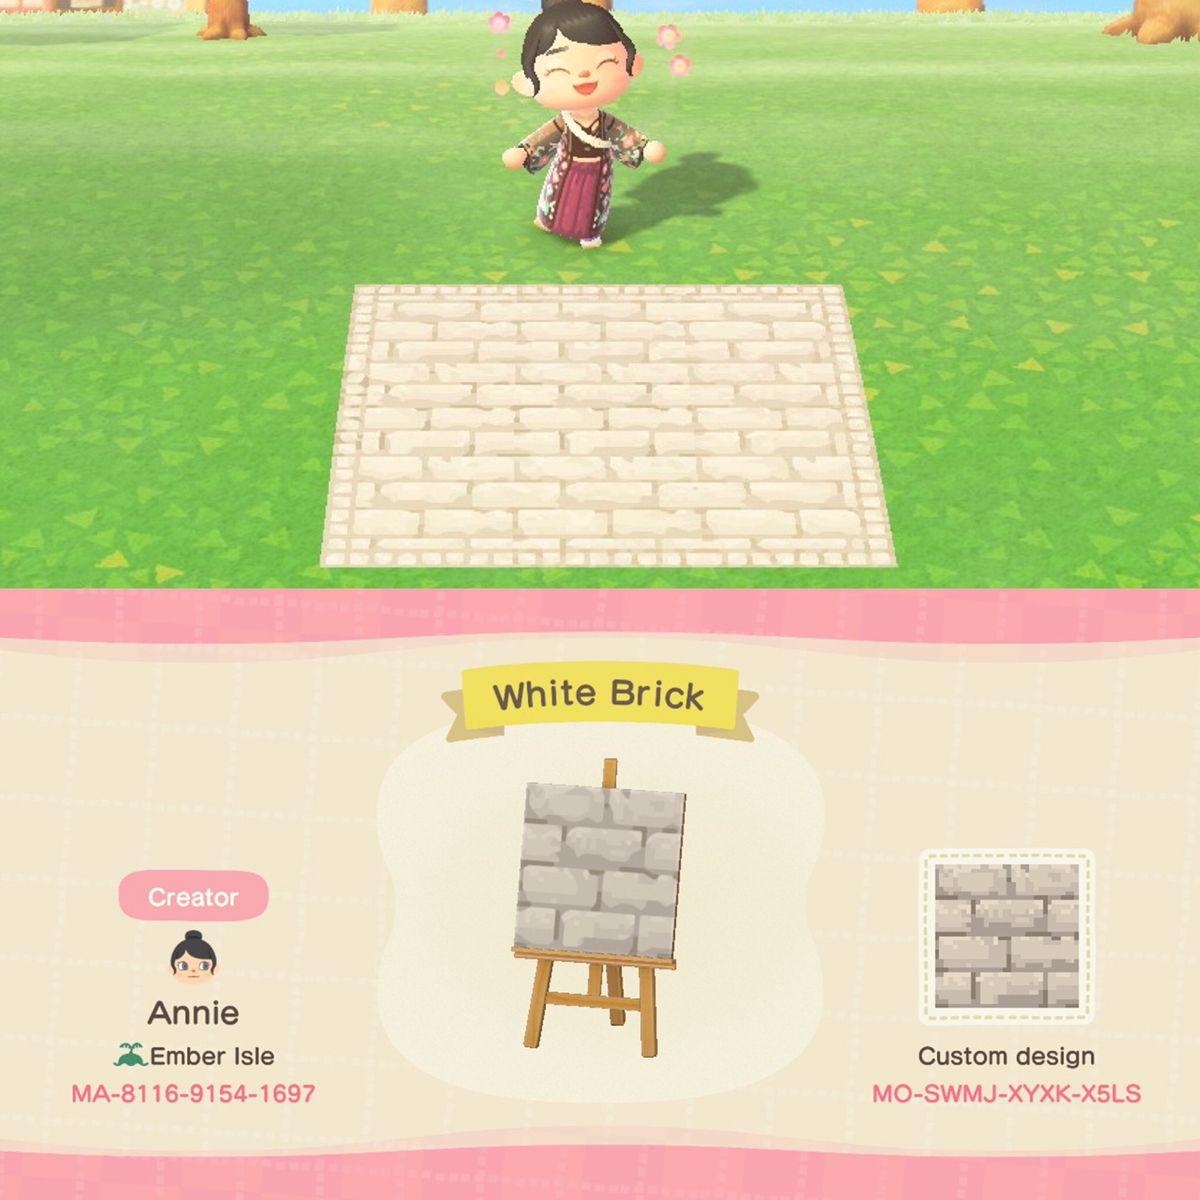 Animal Crossing New Horizons Pathway in 2020 Animal